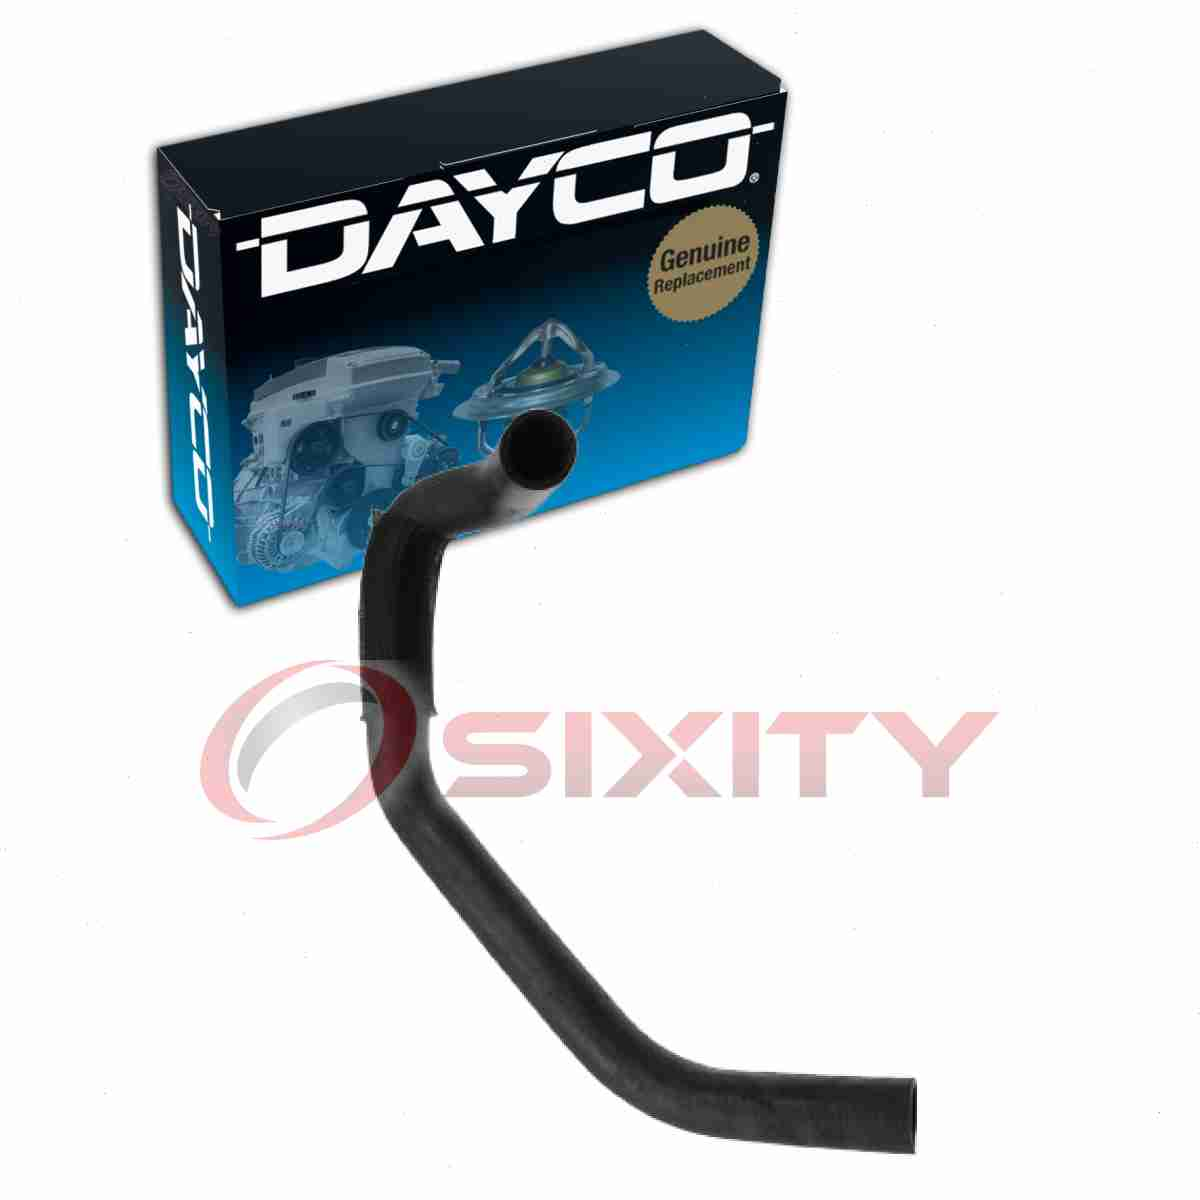 2X Radiator Coolant Hose Upper Lower Dayco For 1997-1999 Dodge Dakota